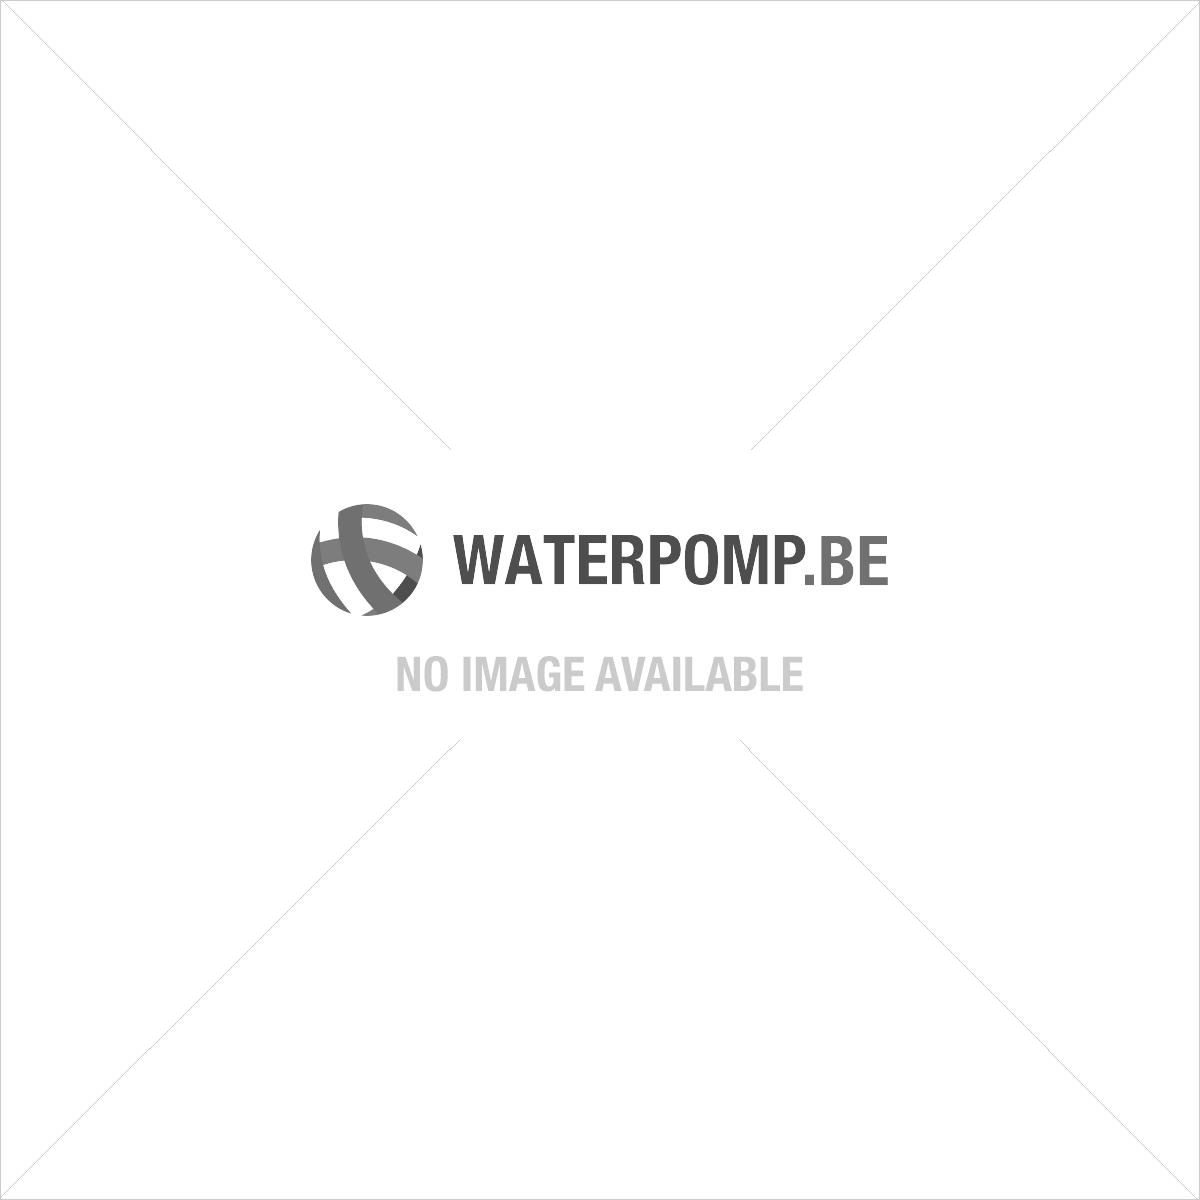 Wonderlijk DAB Jet 102 M + DAB Control-D Hydrofoorpomp – Waterpomp | Waterpomp.be JM-02